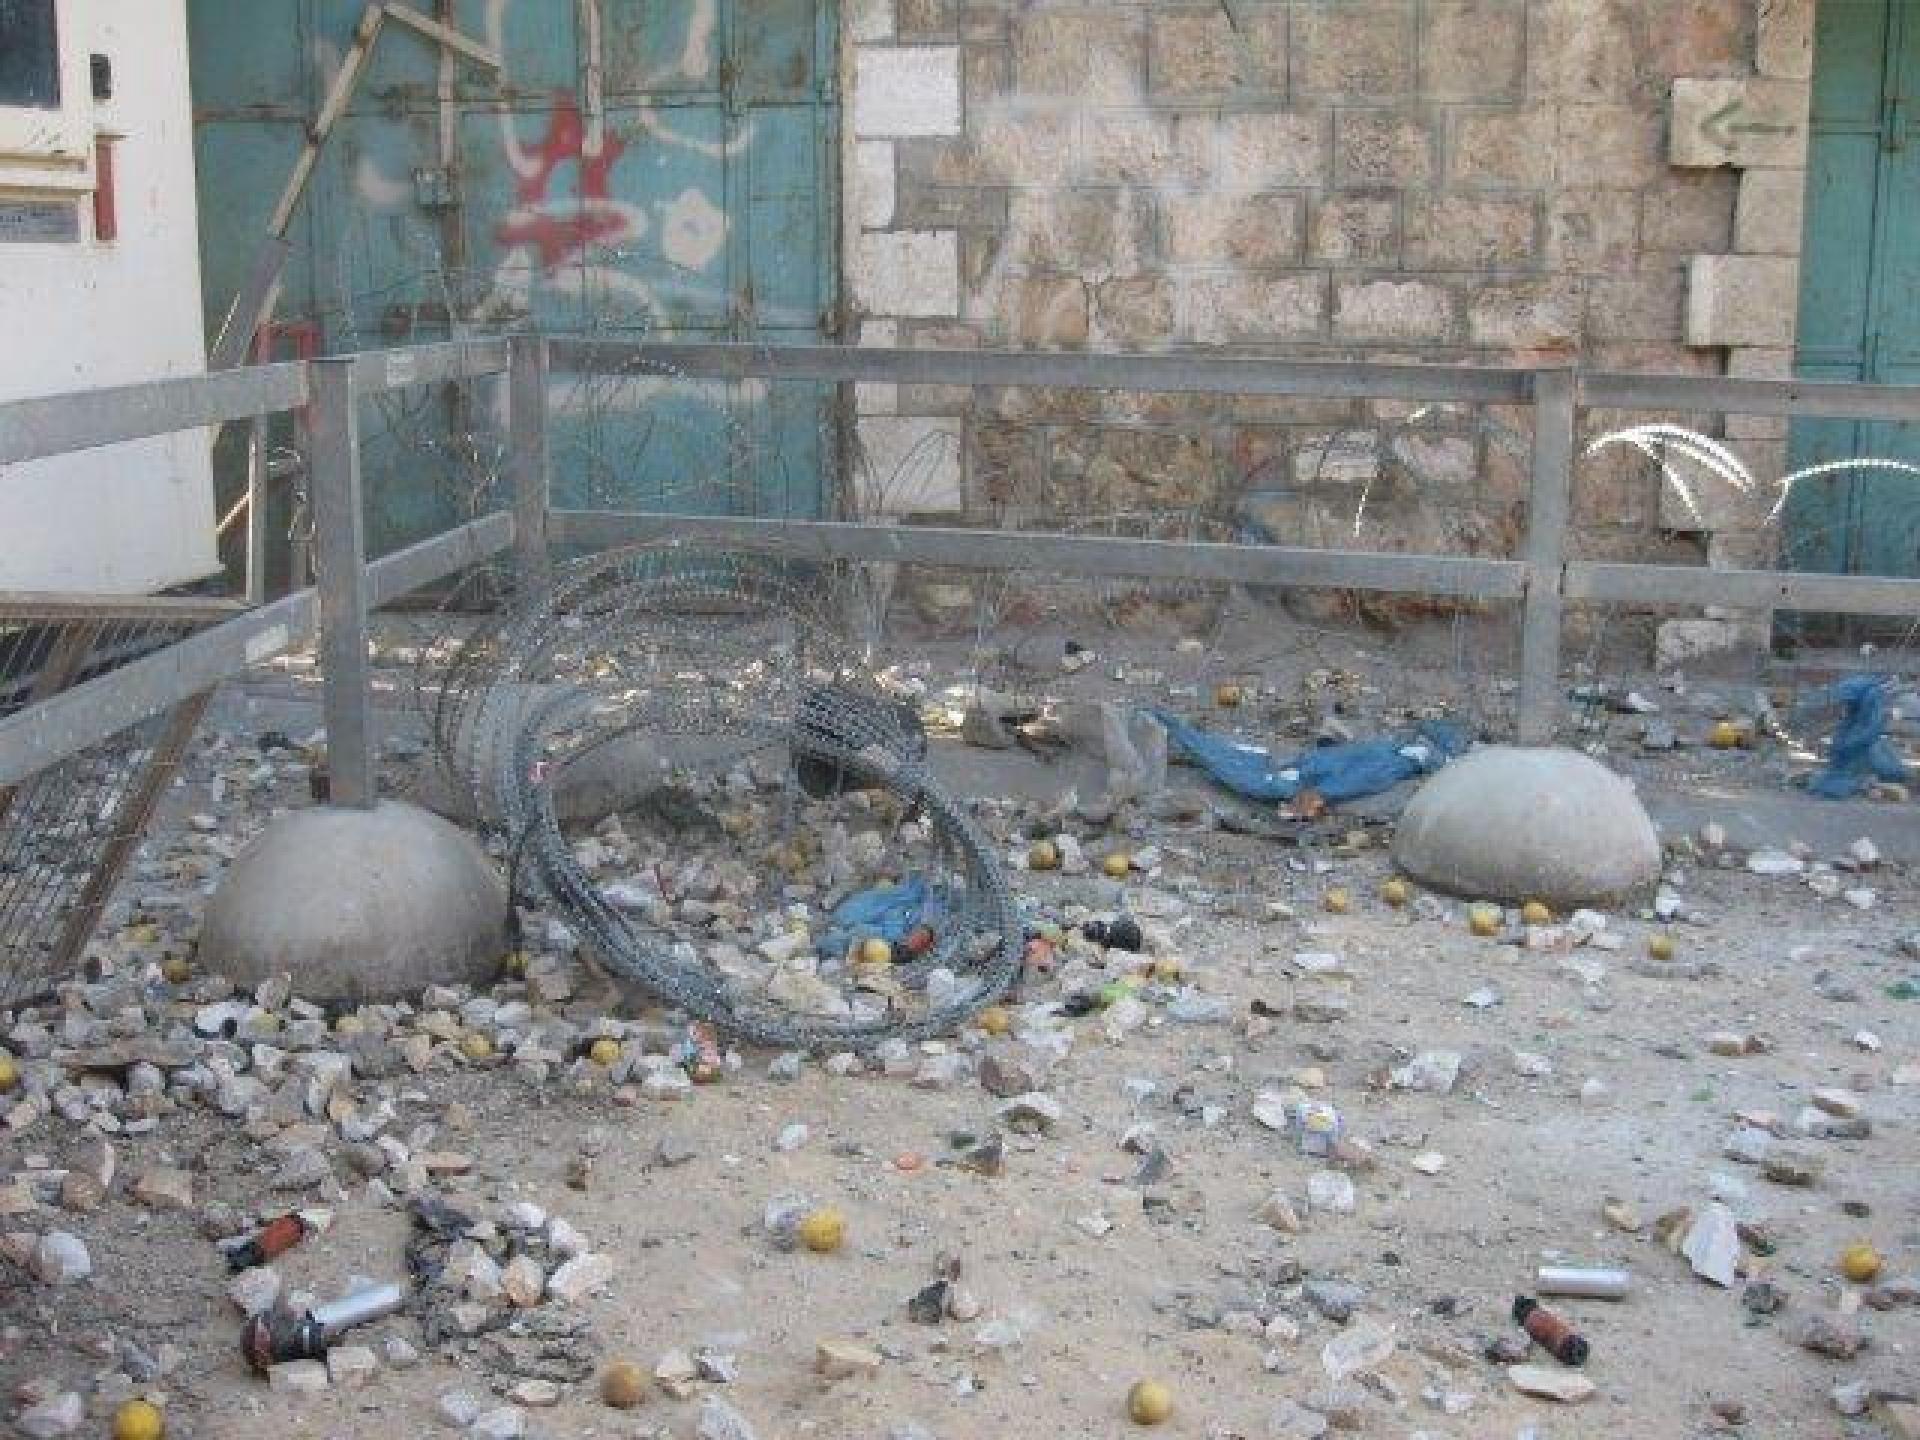 Tarpat checkpoint, Hebron 11.09.12